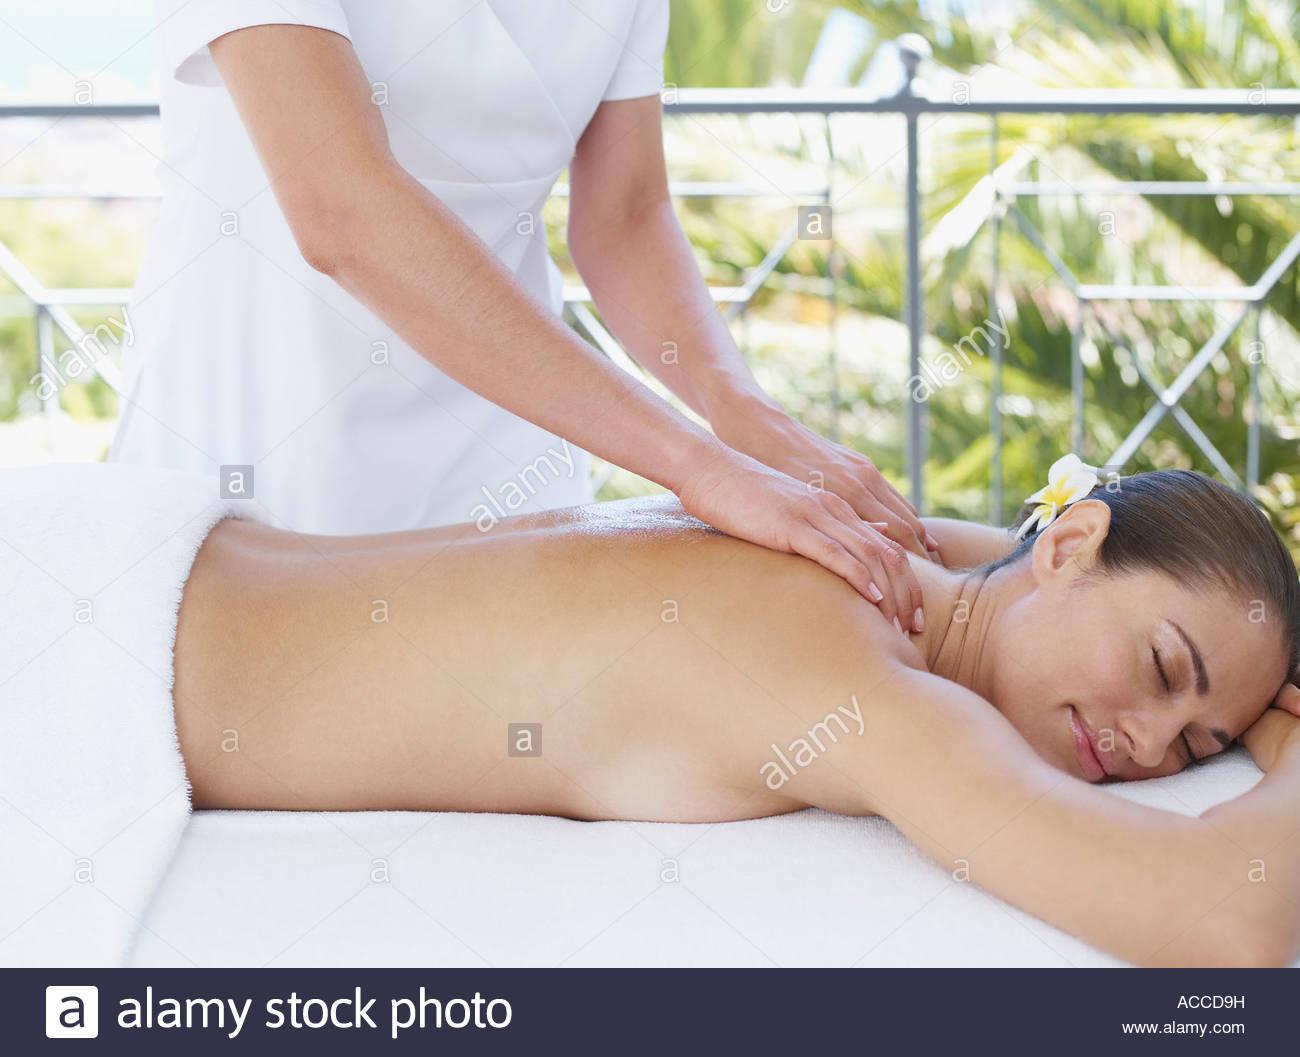 Masseuse giving a woman a back massage - Stock Image